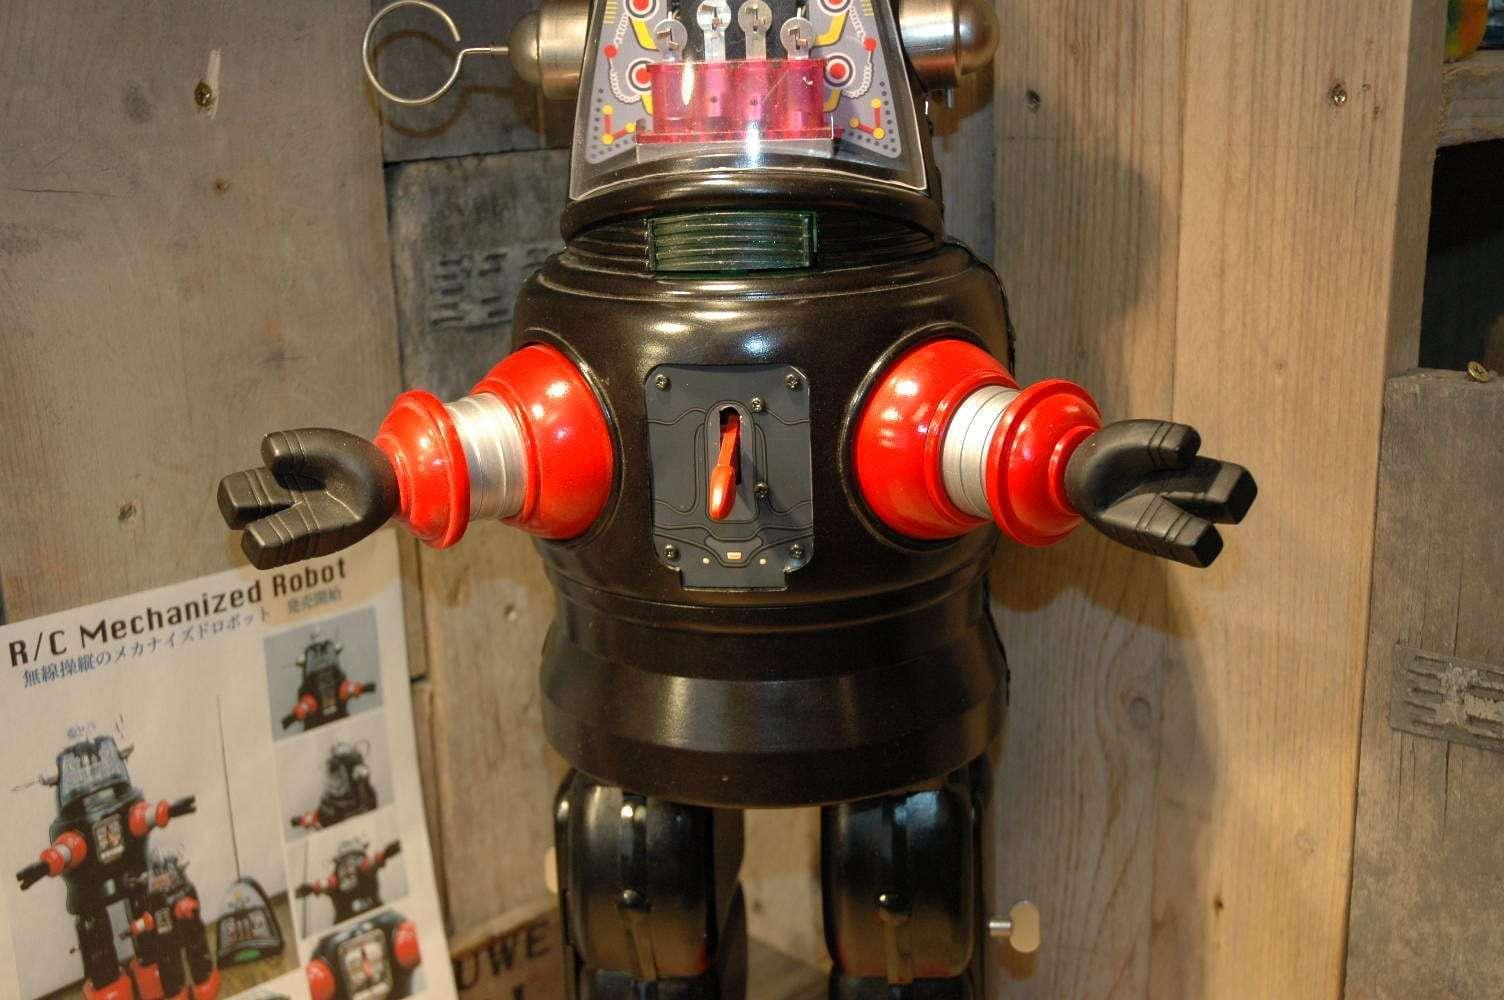 Metal House - RC Mechanized Robby Robot / Prototype